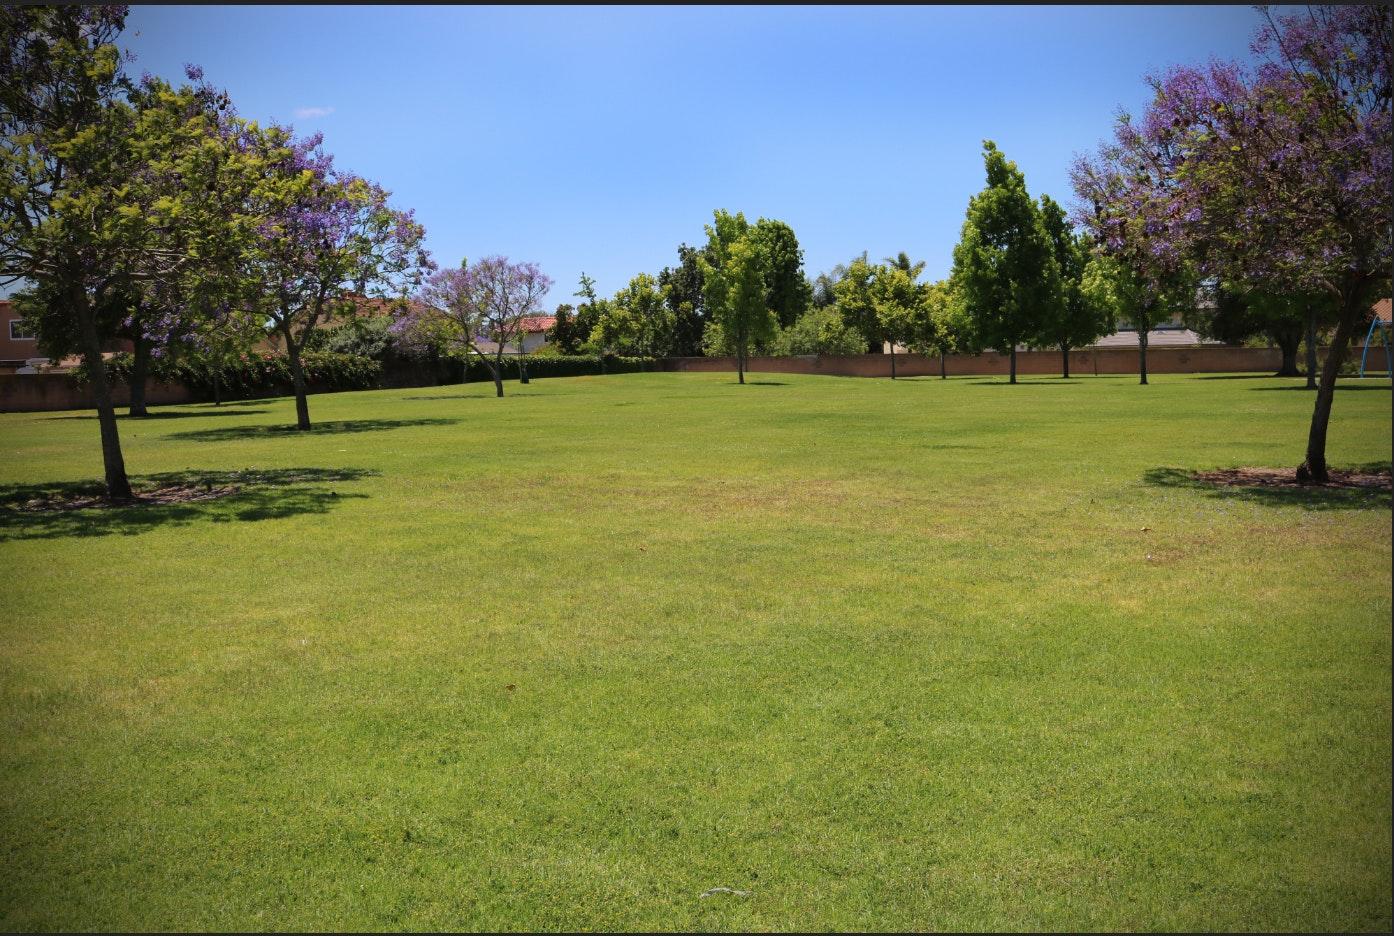 Adolfo Park